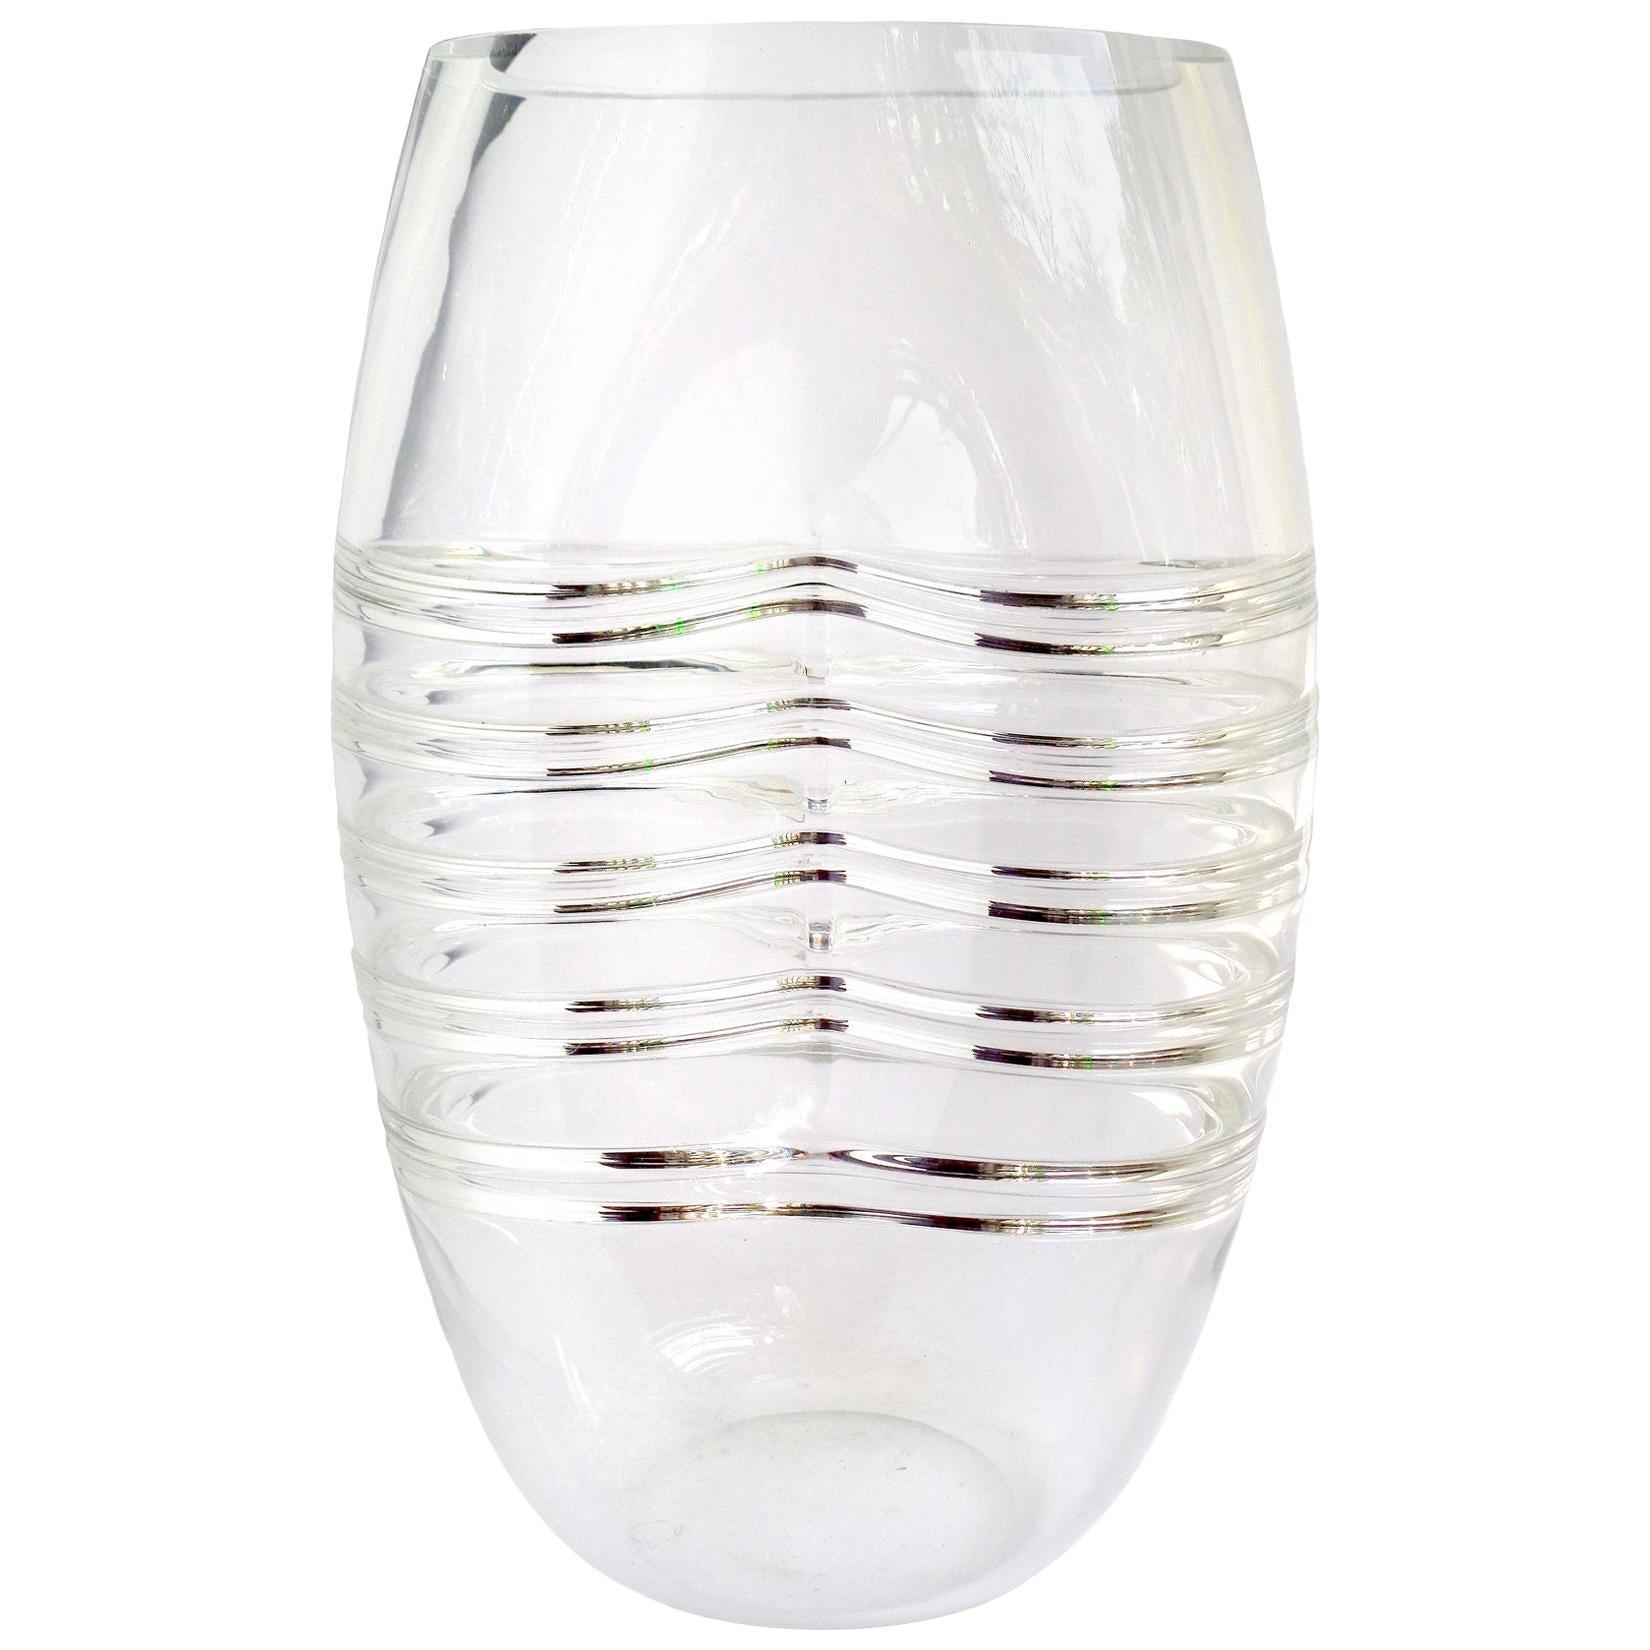 Alfredo Barbini Murano Signed Rib Cage Design Italian Art Glass Flower Vase